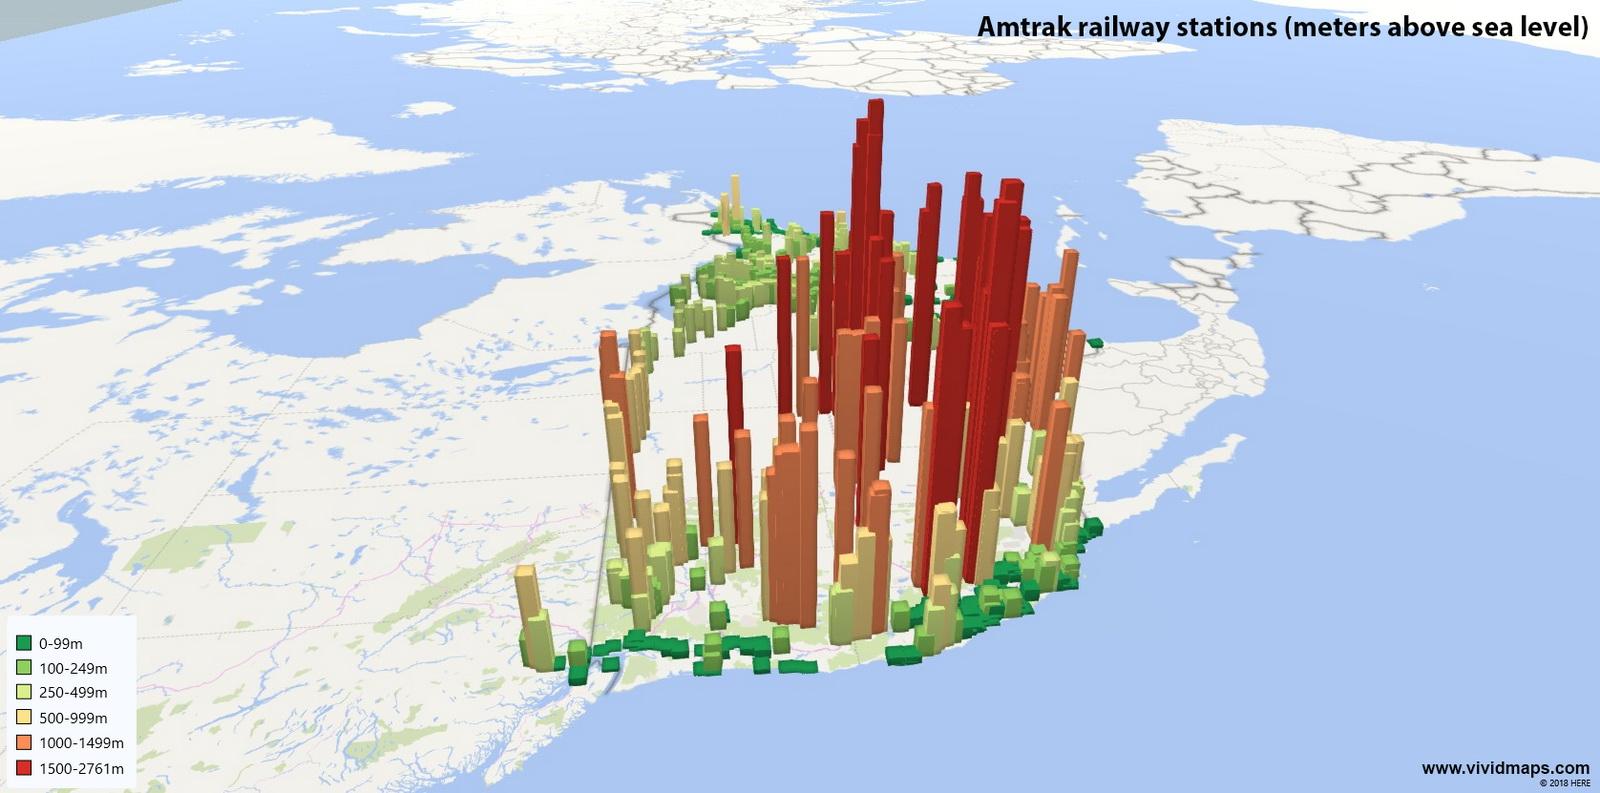 American railway stations